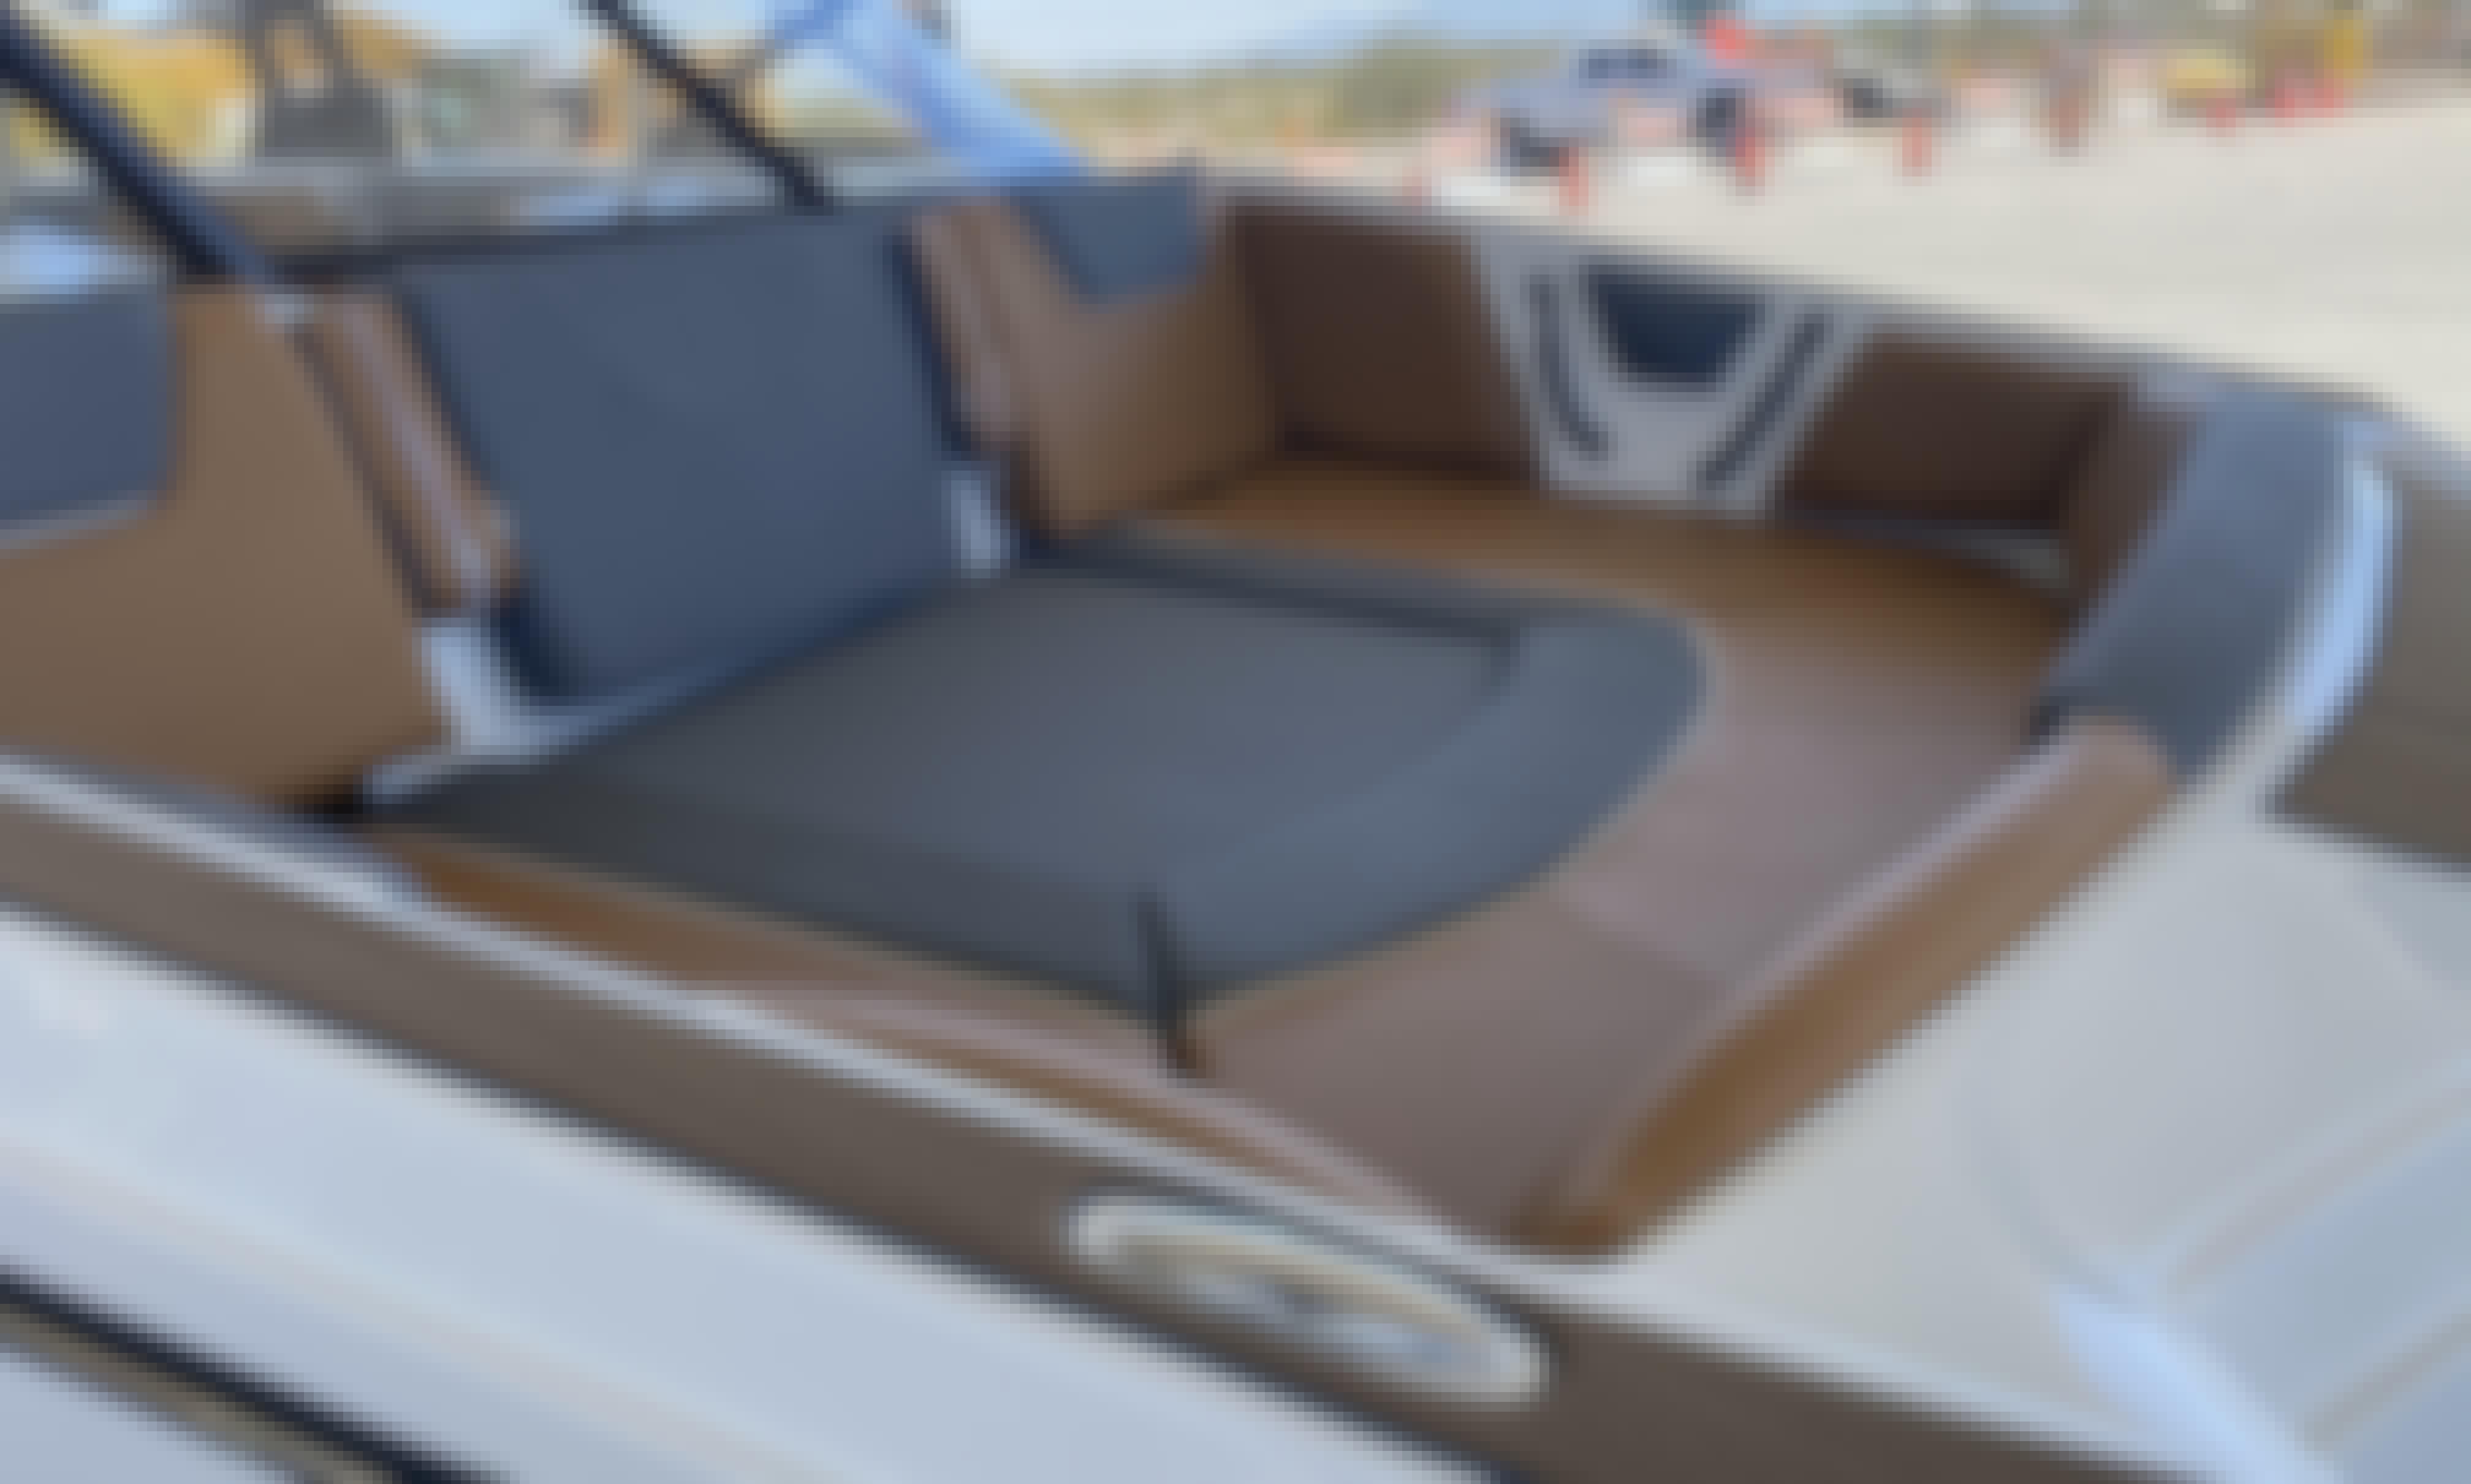 Stunning NEW Heyday WT2 Wakeboat in Lake Havasu City